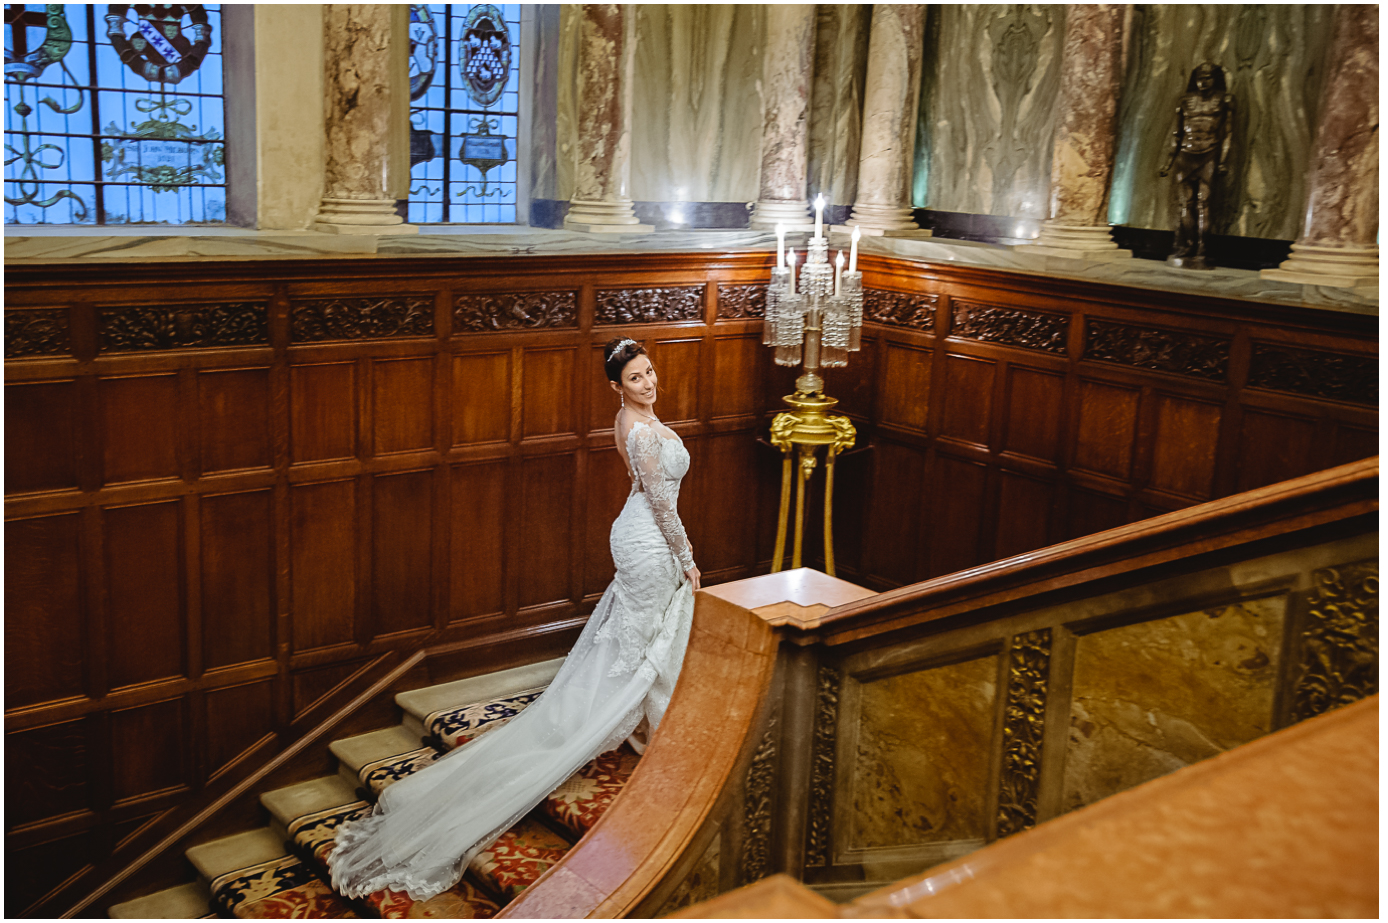 drapers-hall-London-interior